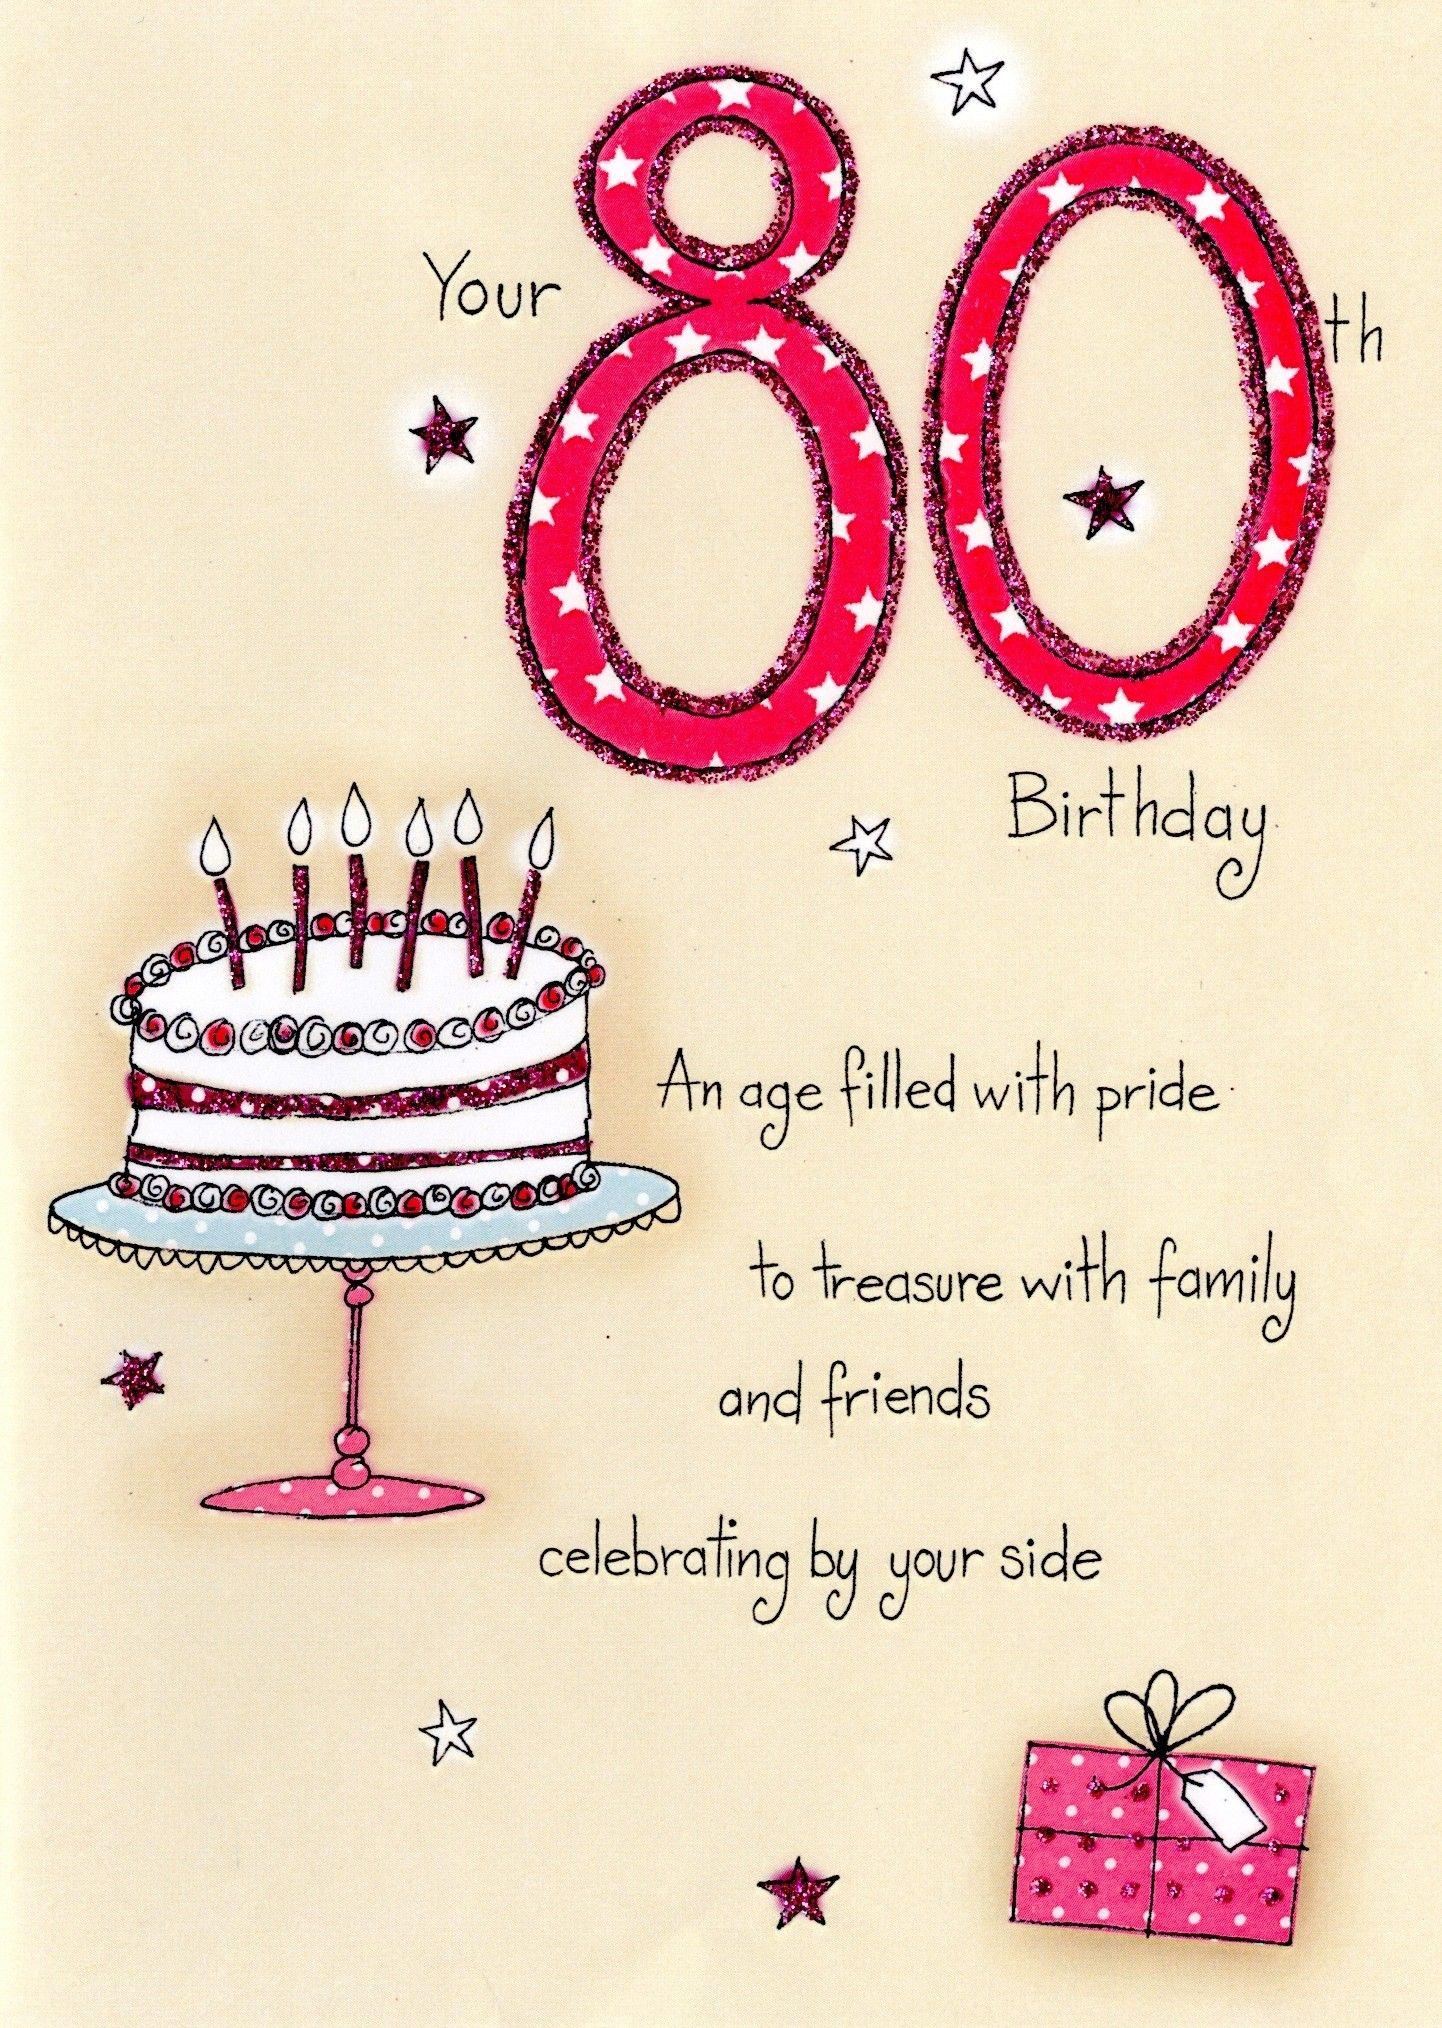 80th Birthday Greetings Images : birthday, greetings, images, Birthday, Wishes:, Write, Cards,, Wishes, Friend,, Cards, Boyfriend